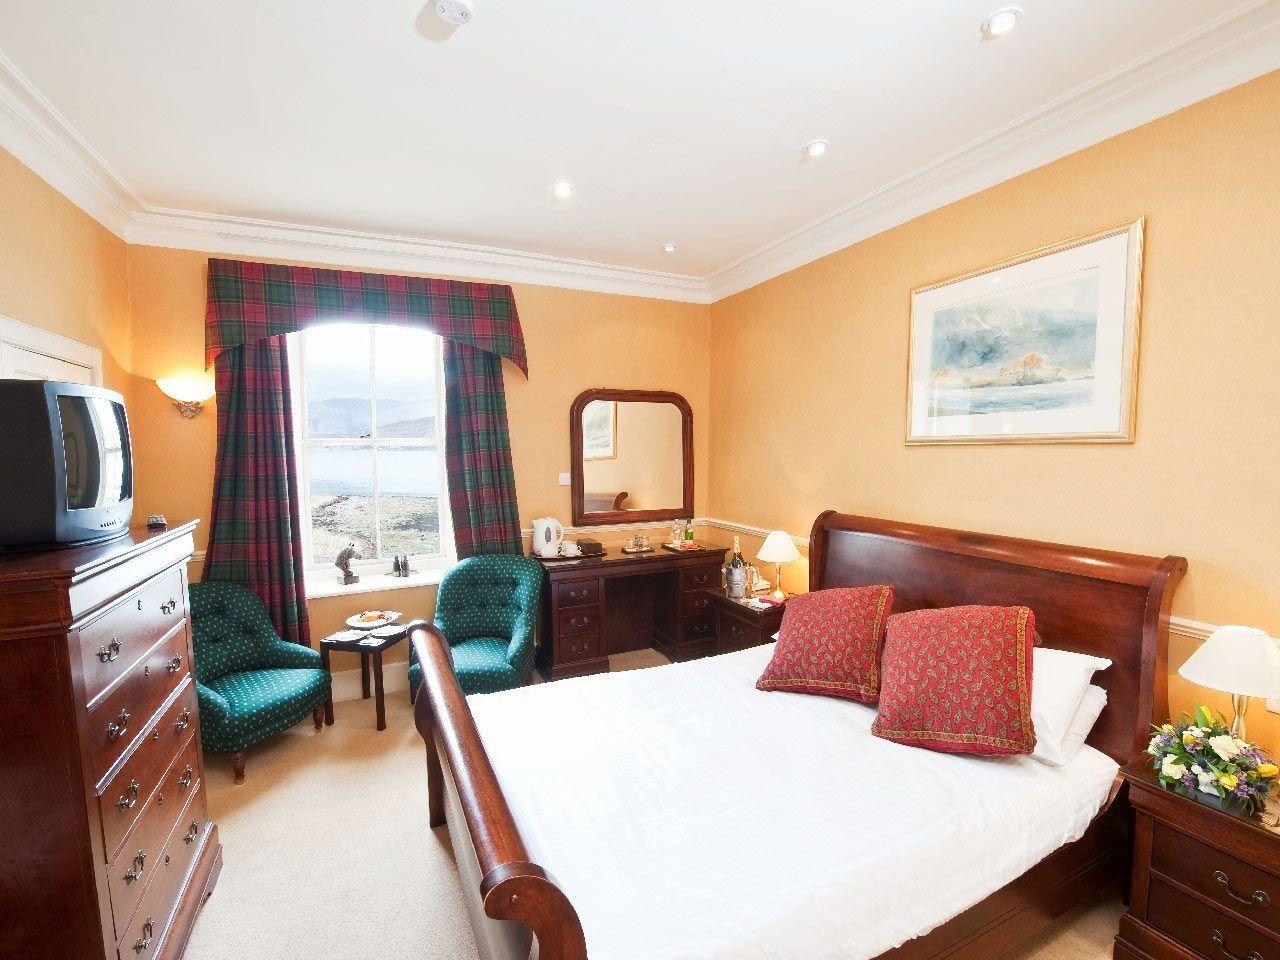 The Ballachulish Hotel | Accommodation in Glencoe near Fort William.